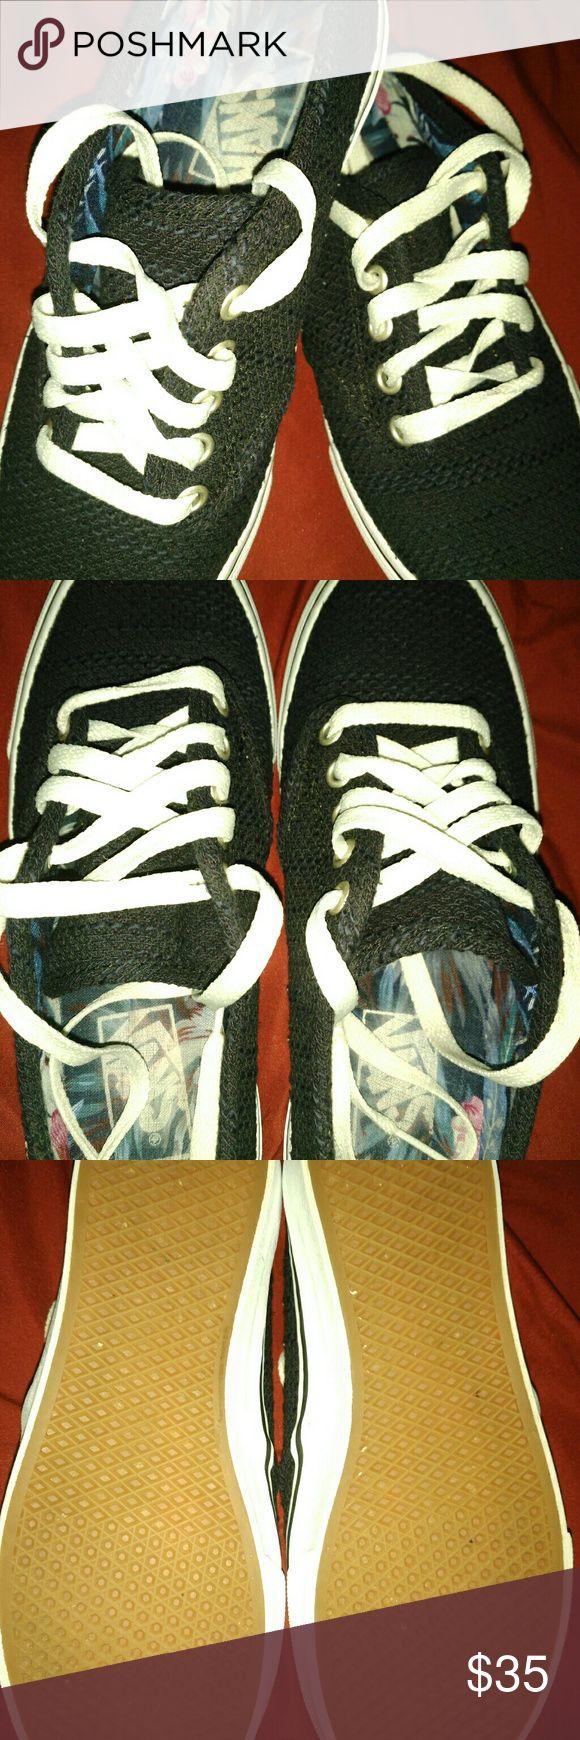 Dark Navy blue Van's NO trade's Worn only 2 times Vans Shoes Sneakers